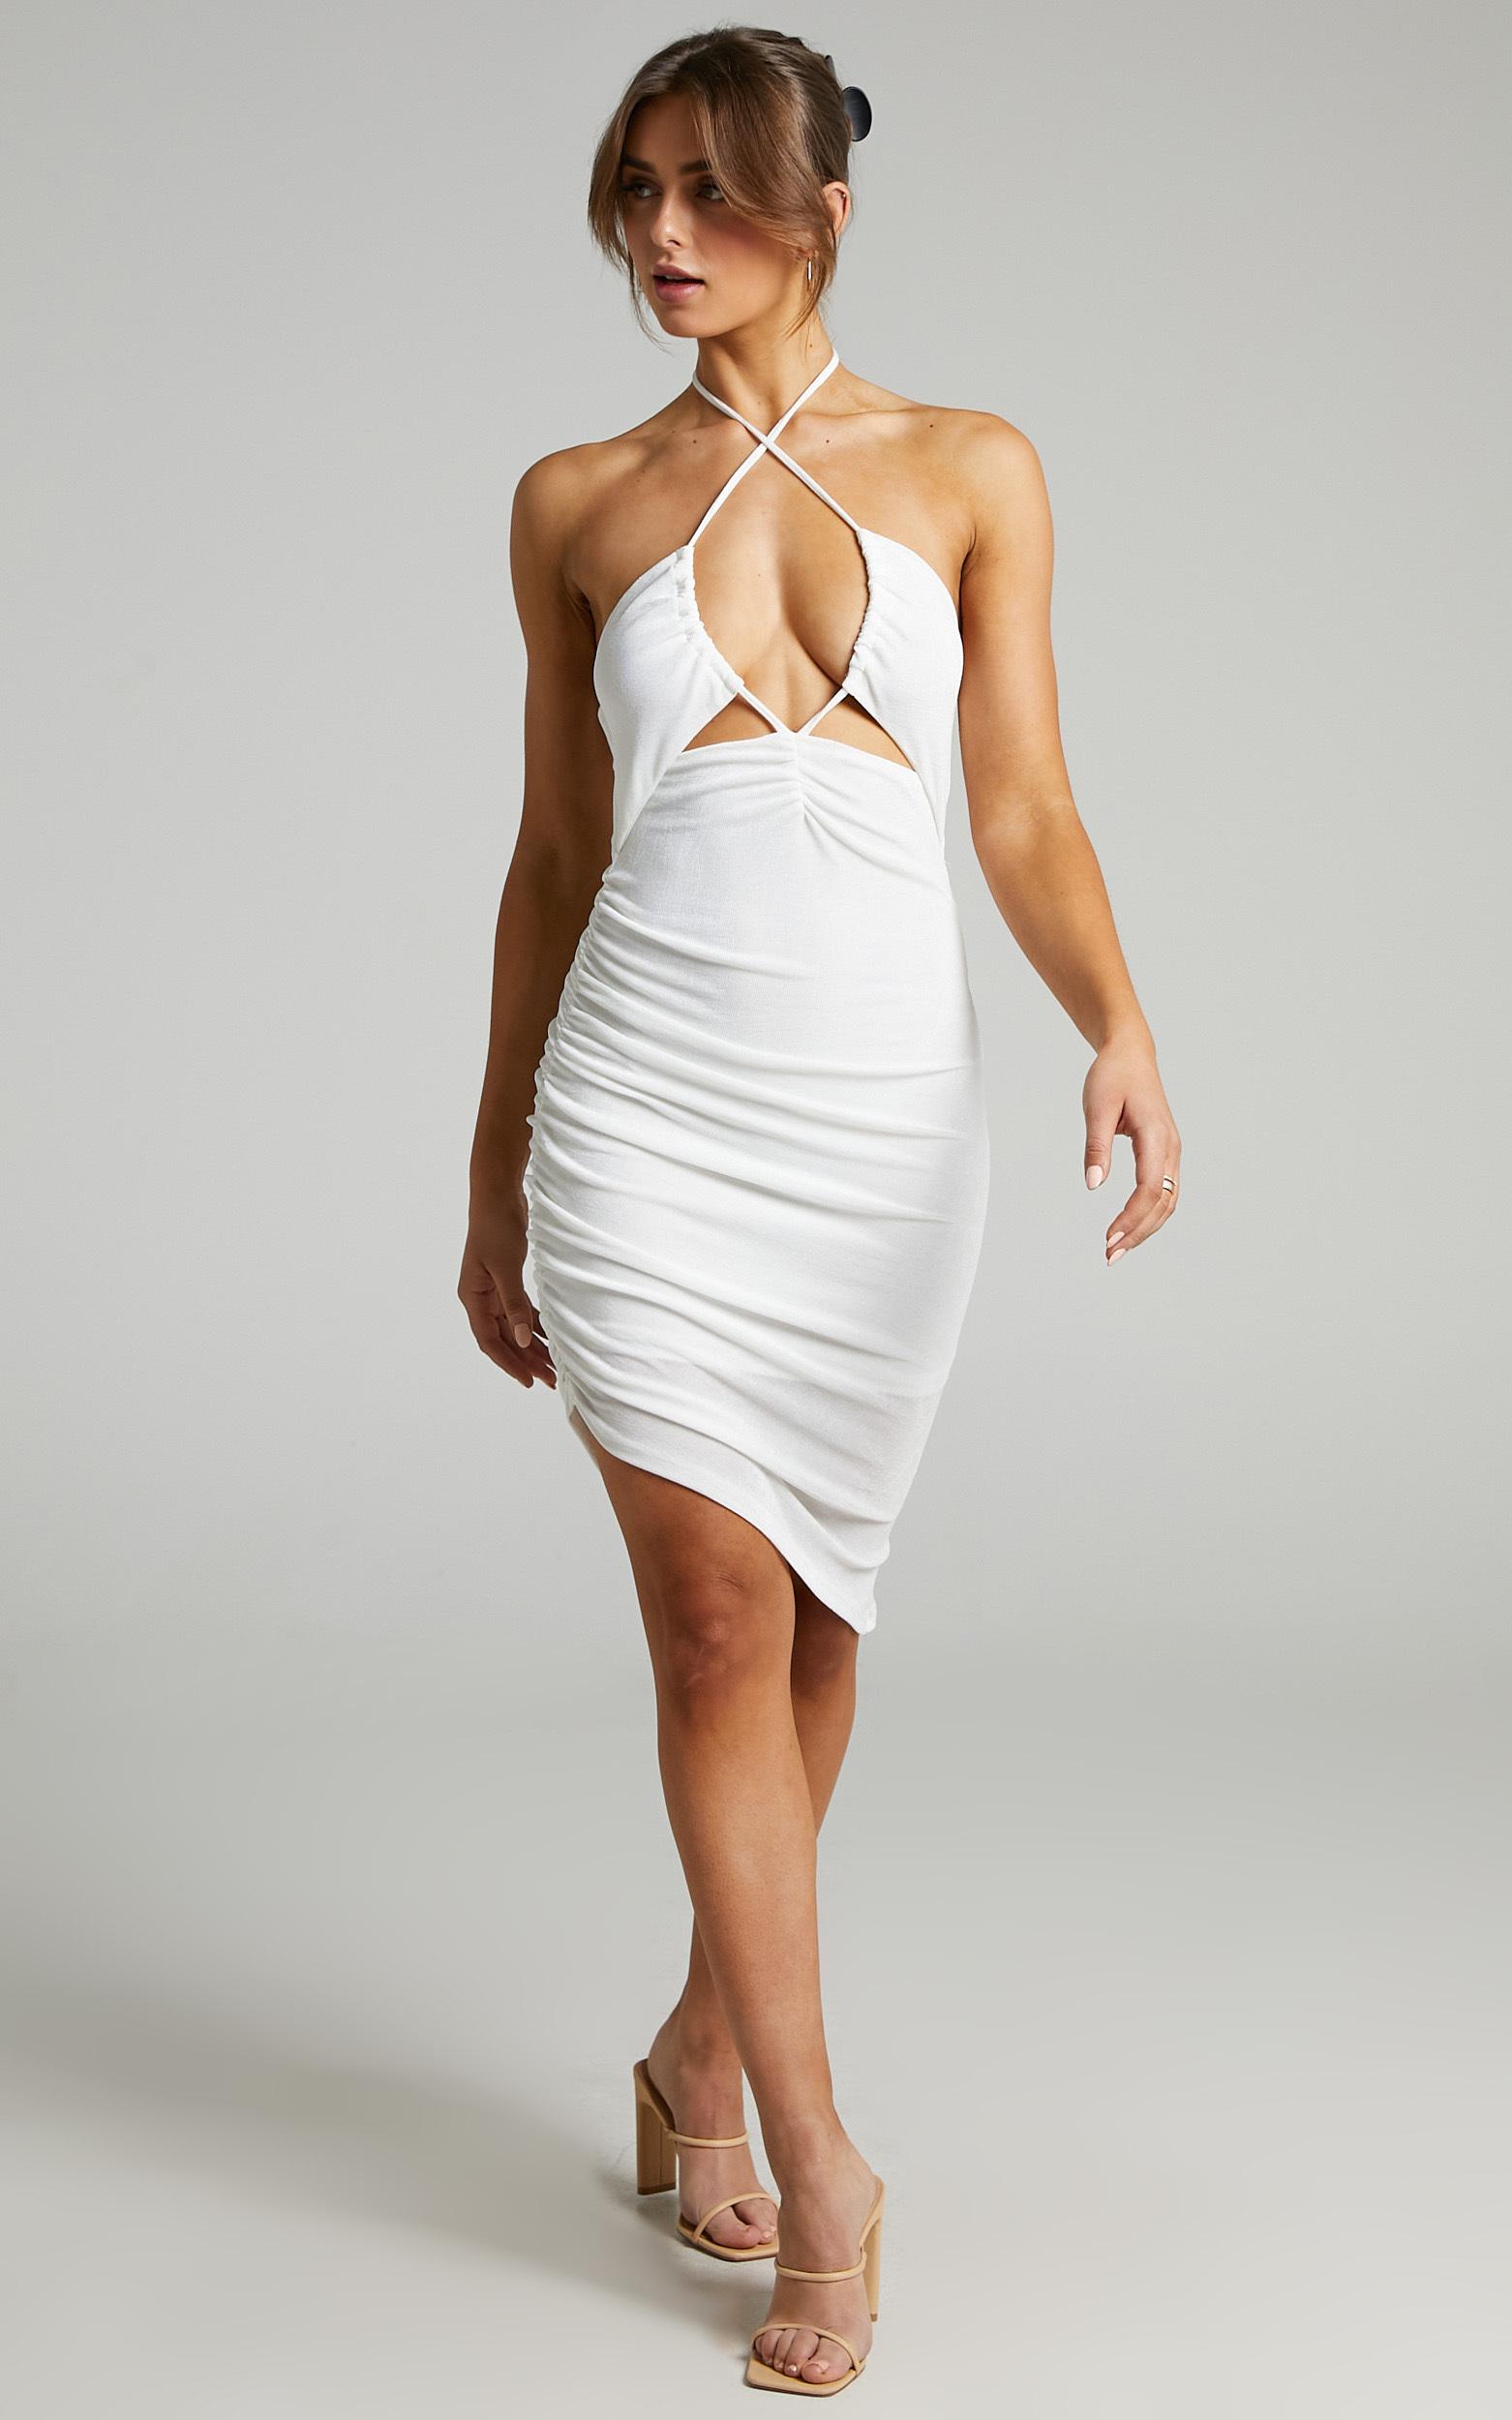 SNDYS - Paris Dress in White - L, WHT1, hi-res image number null